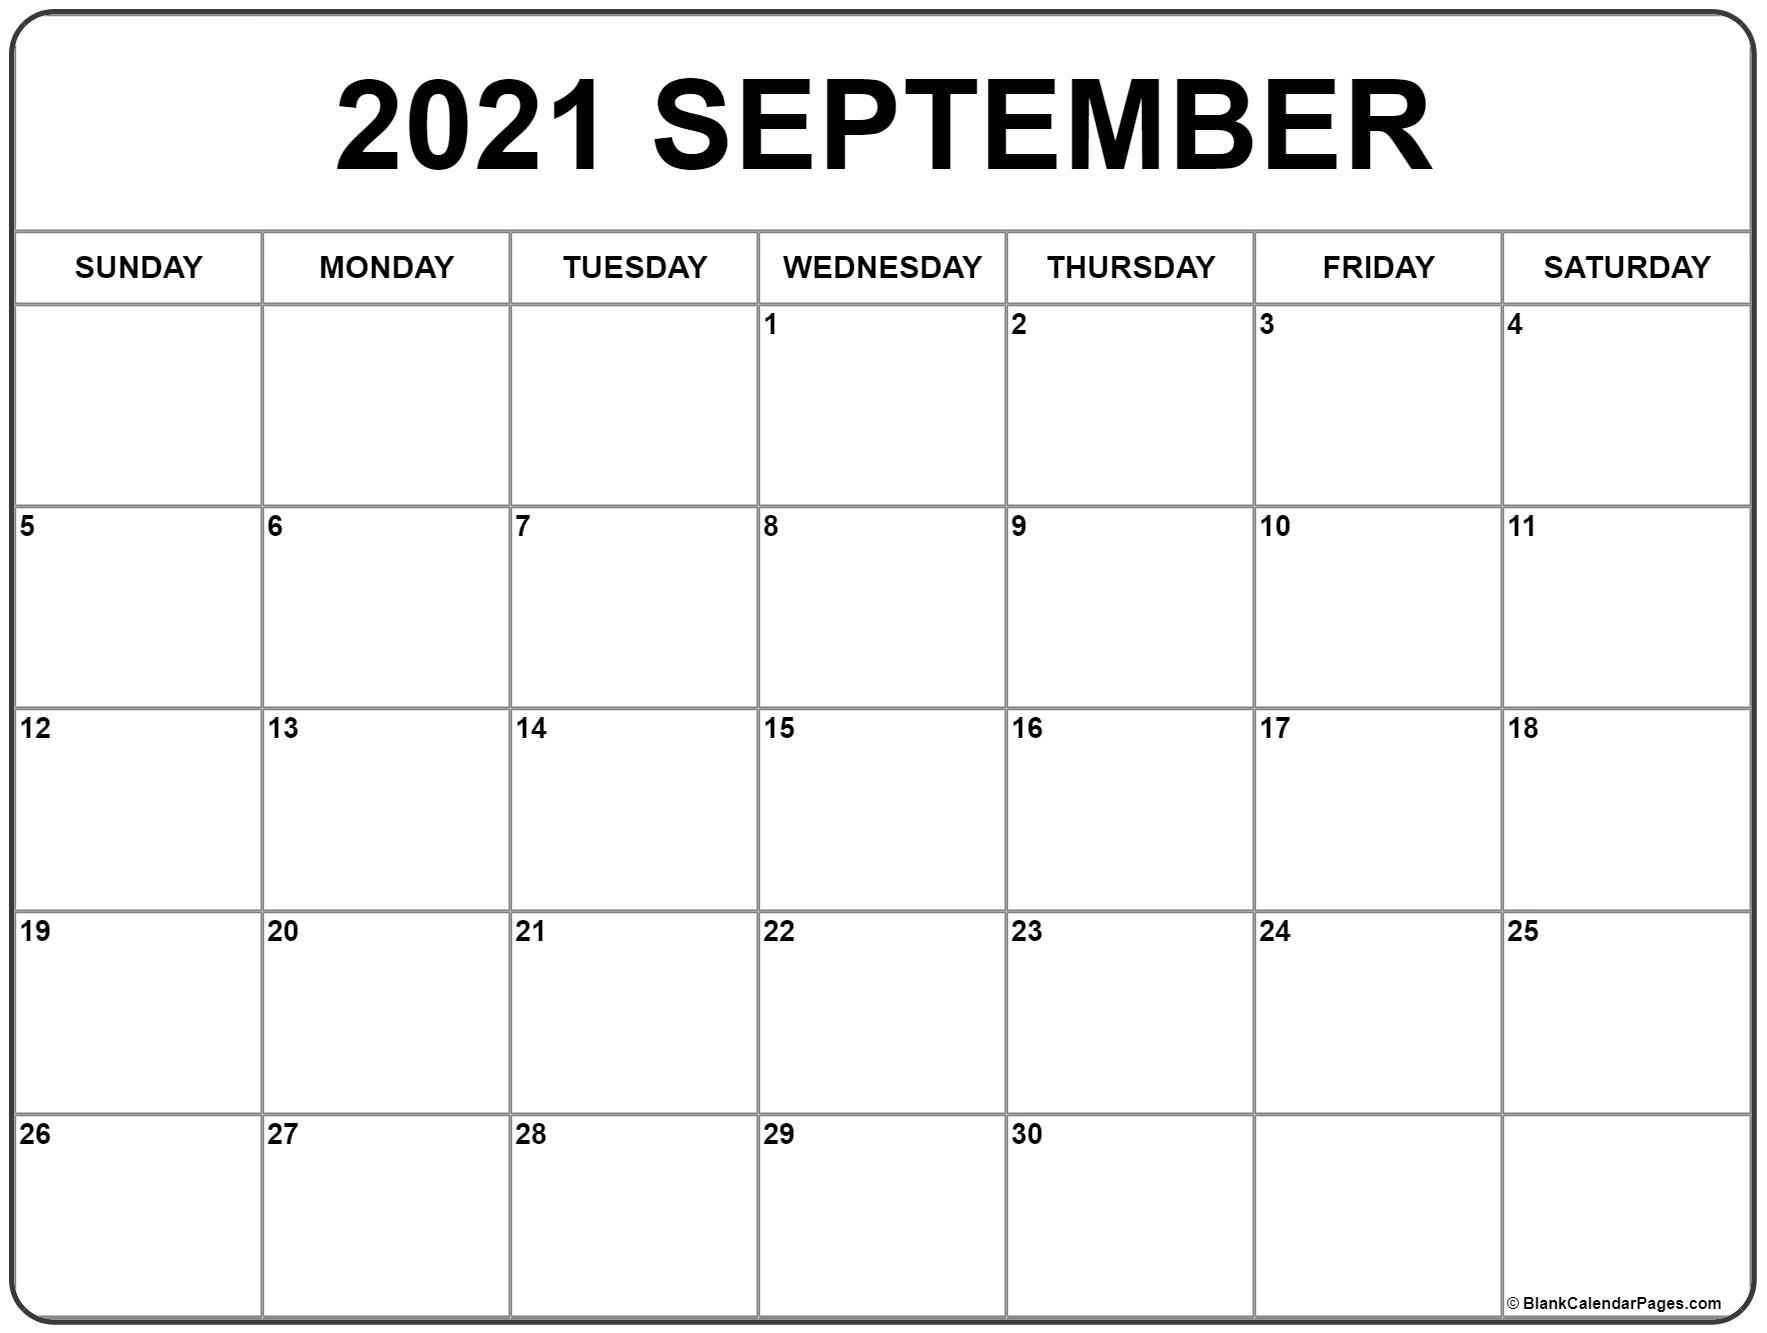 September 2021 Calendar   Free Printable Monthly Calendars